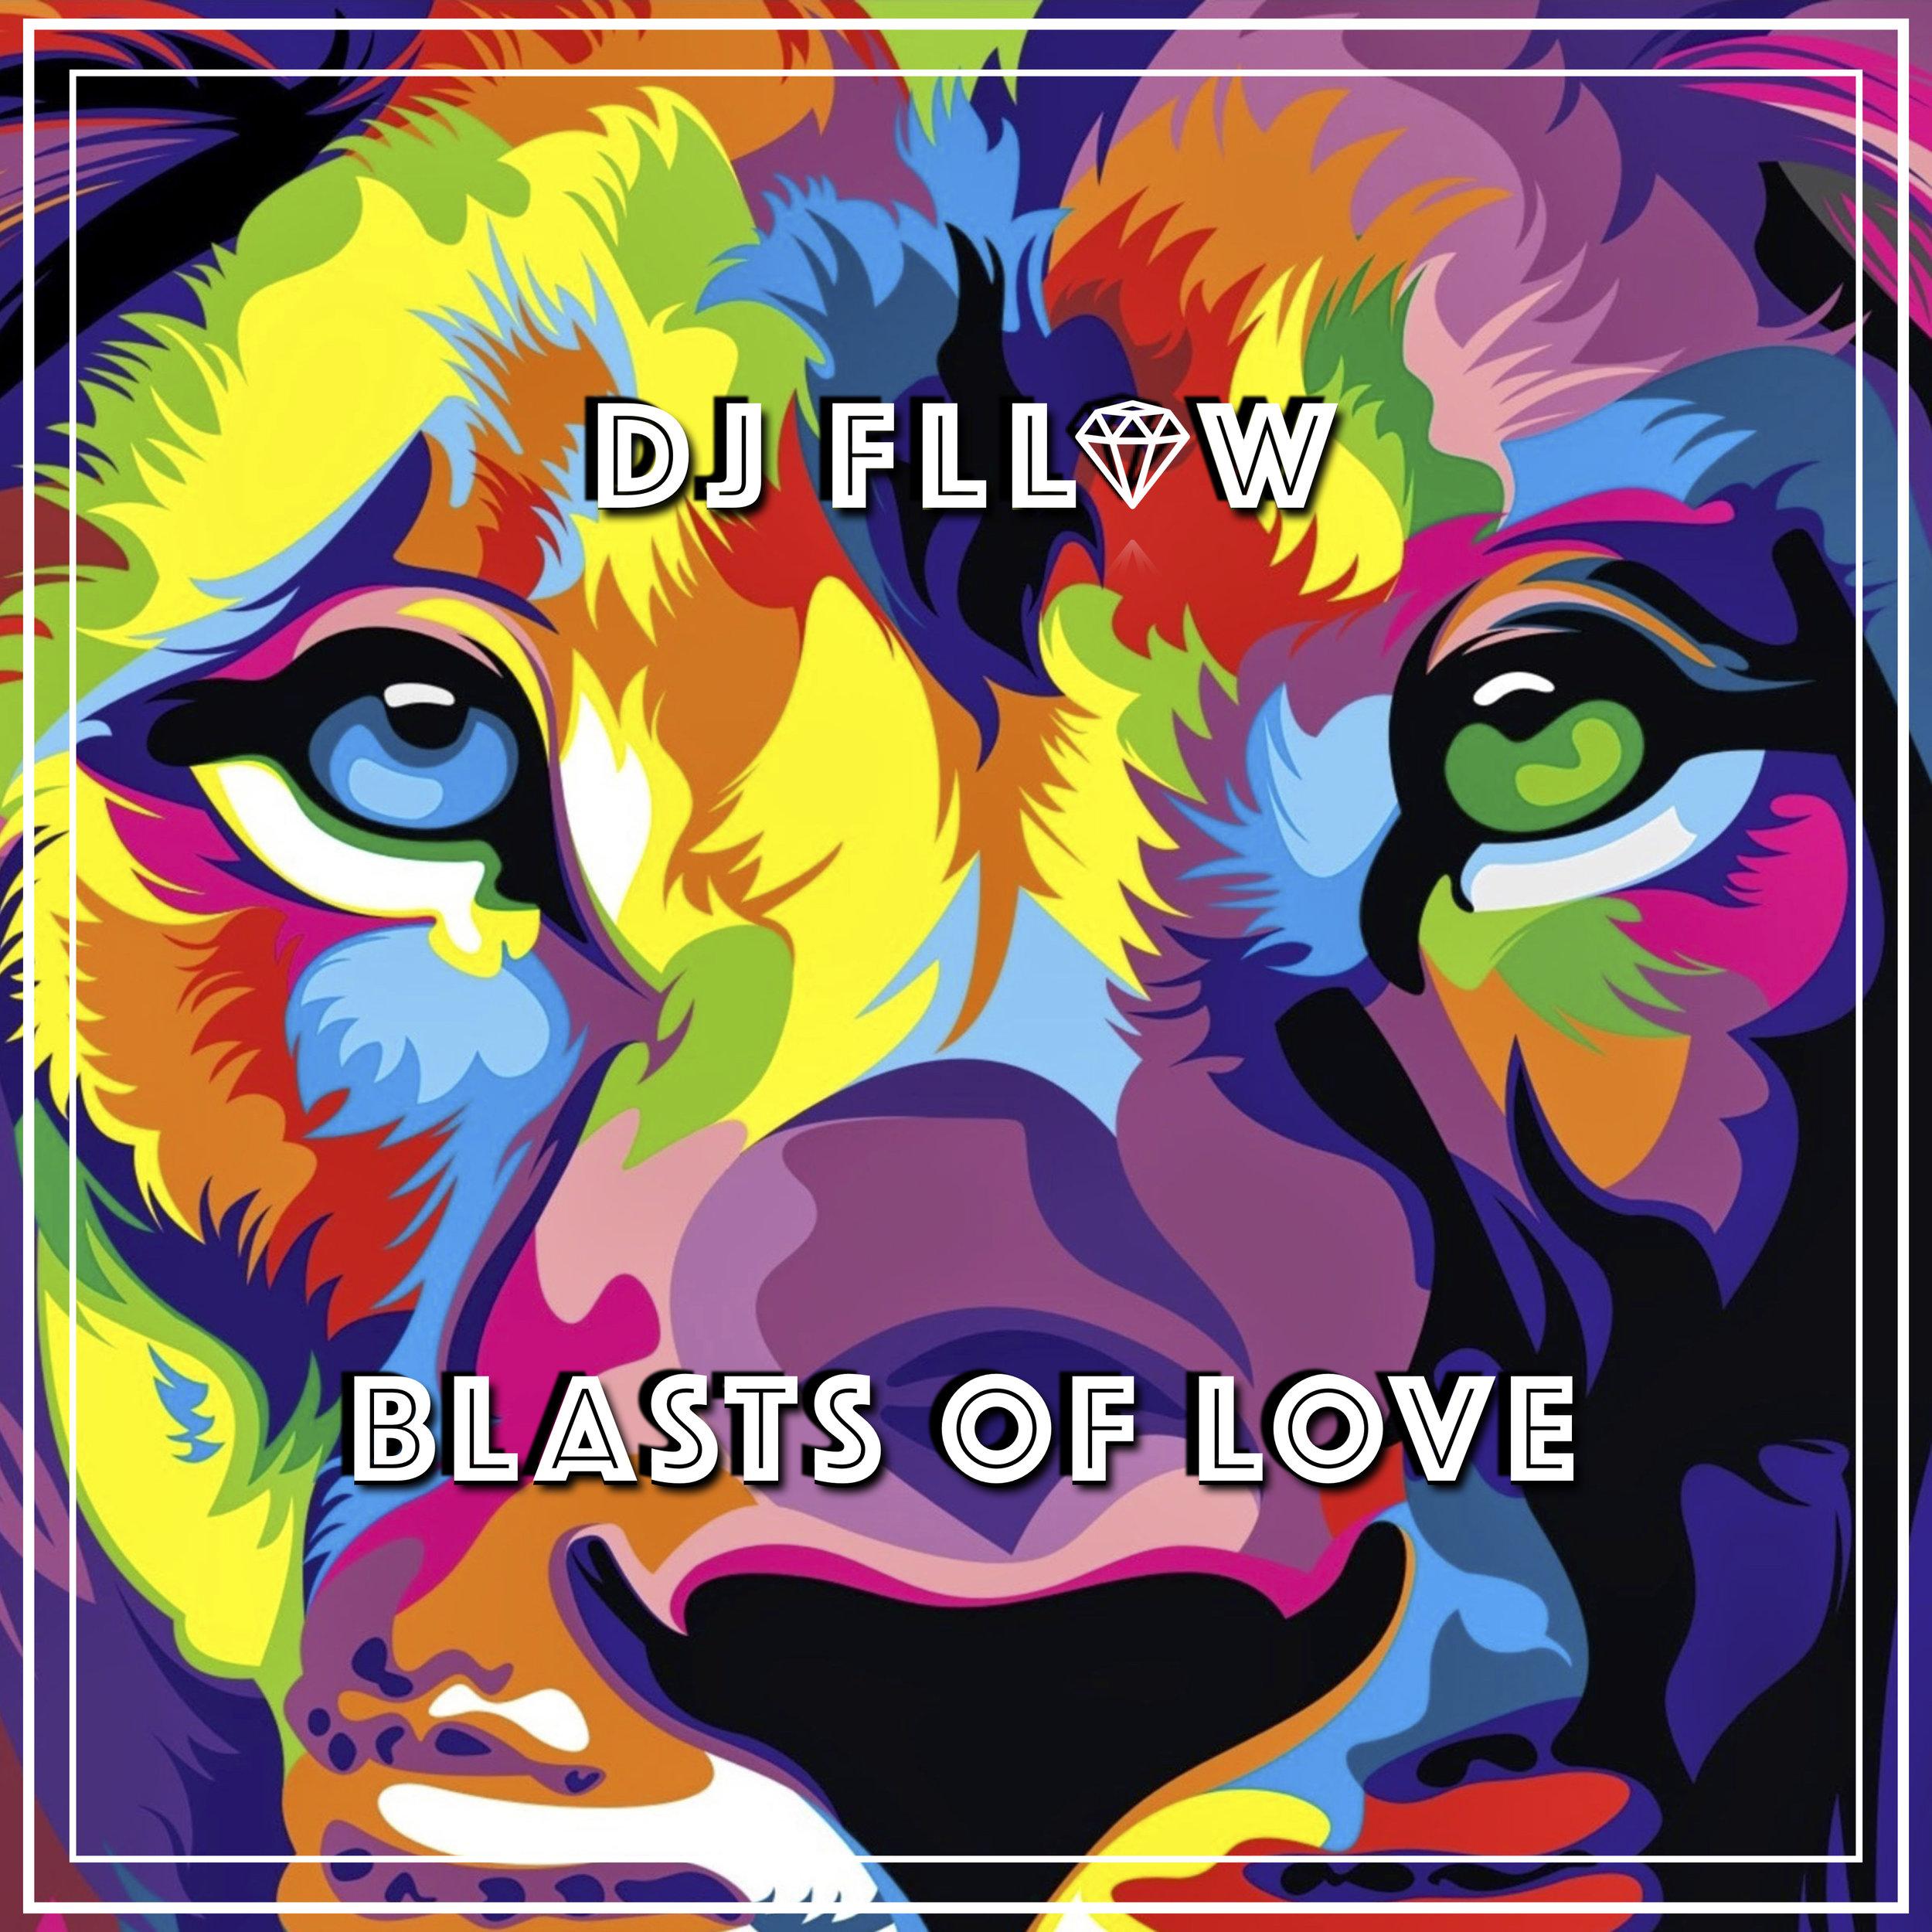 BLASTS OF LOVE LION.jpg